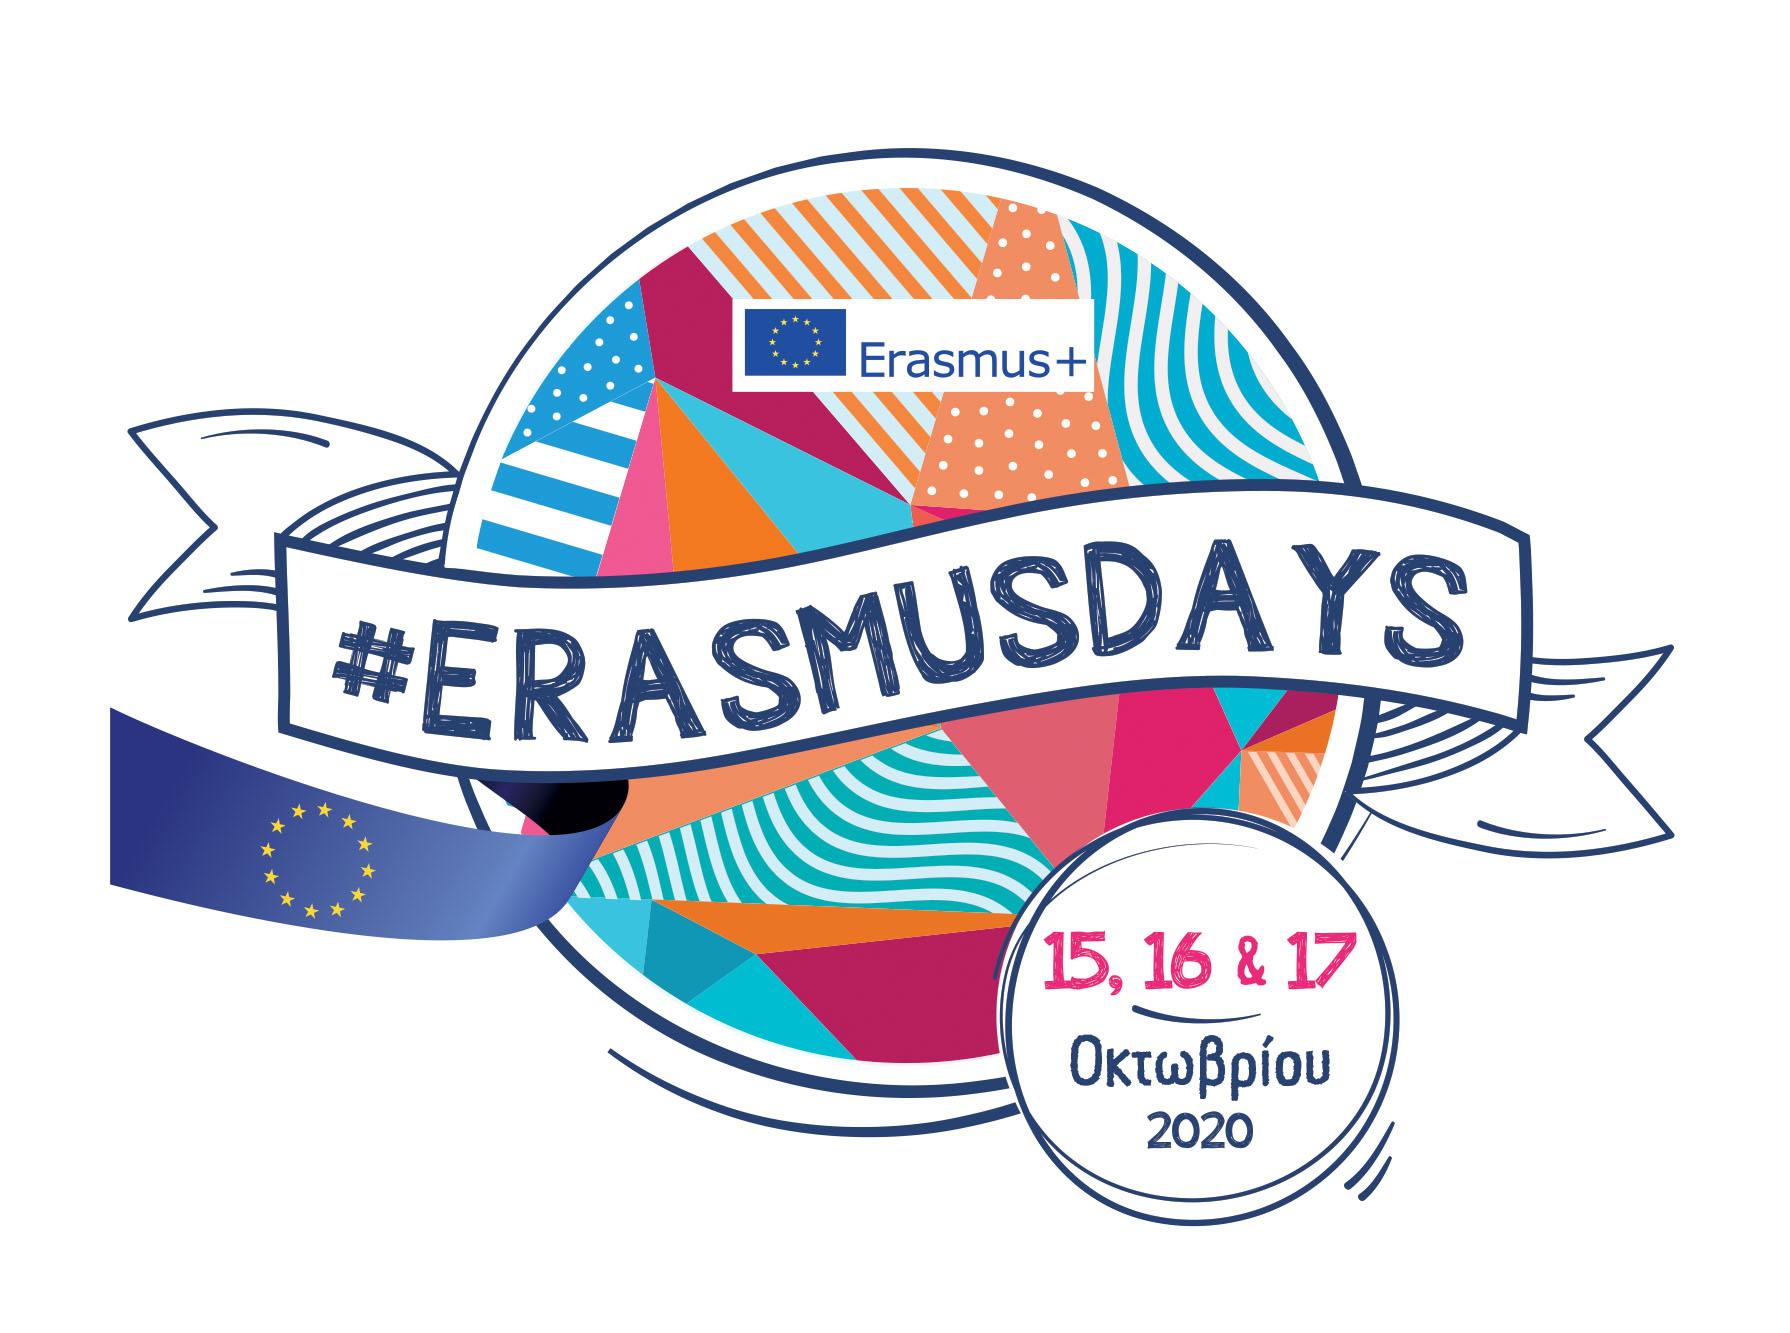 erasmusdays_logo.jpg